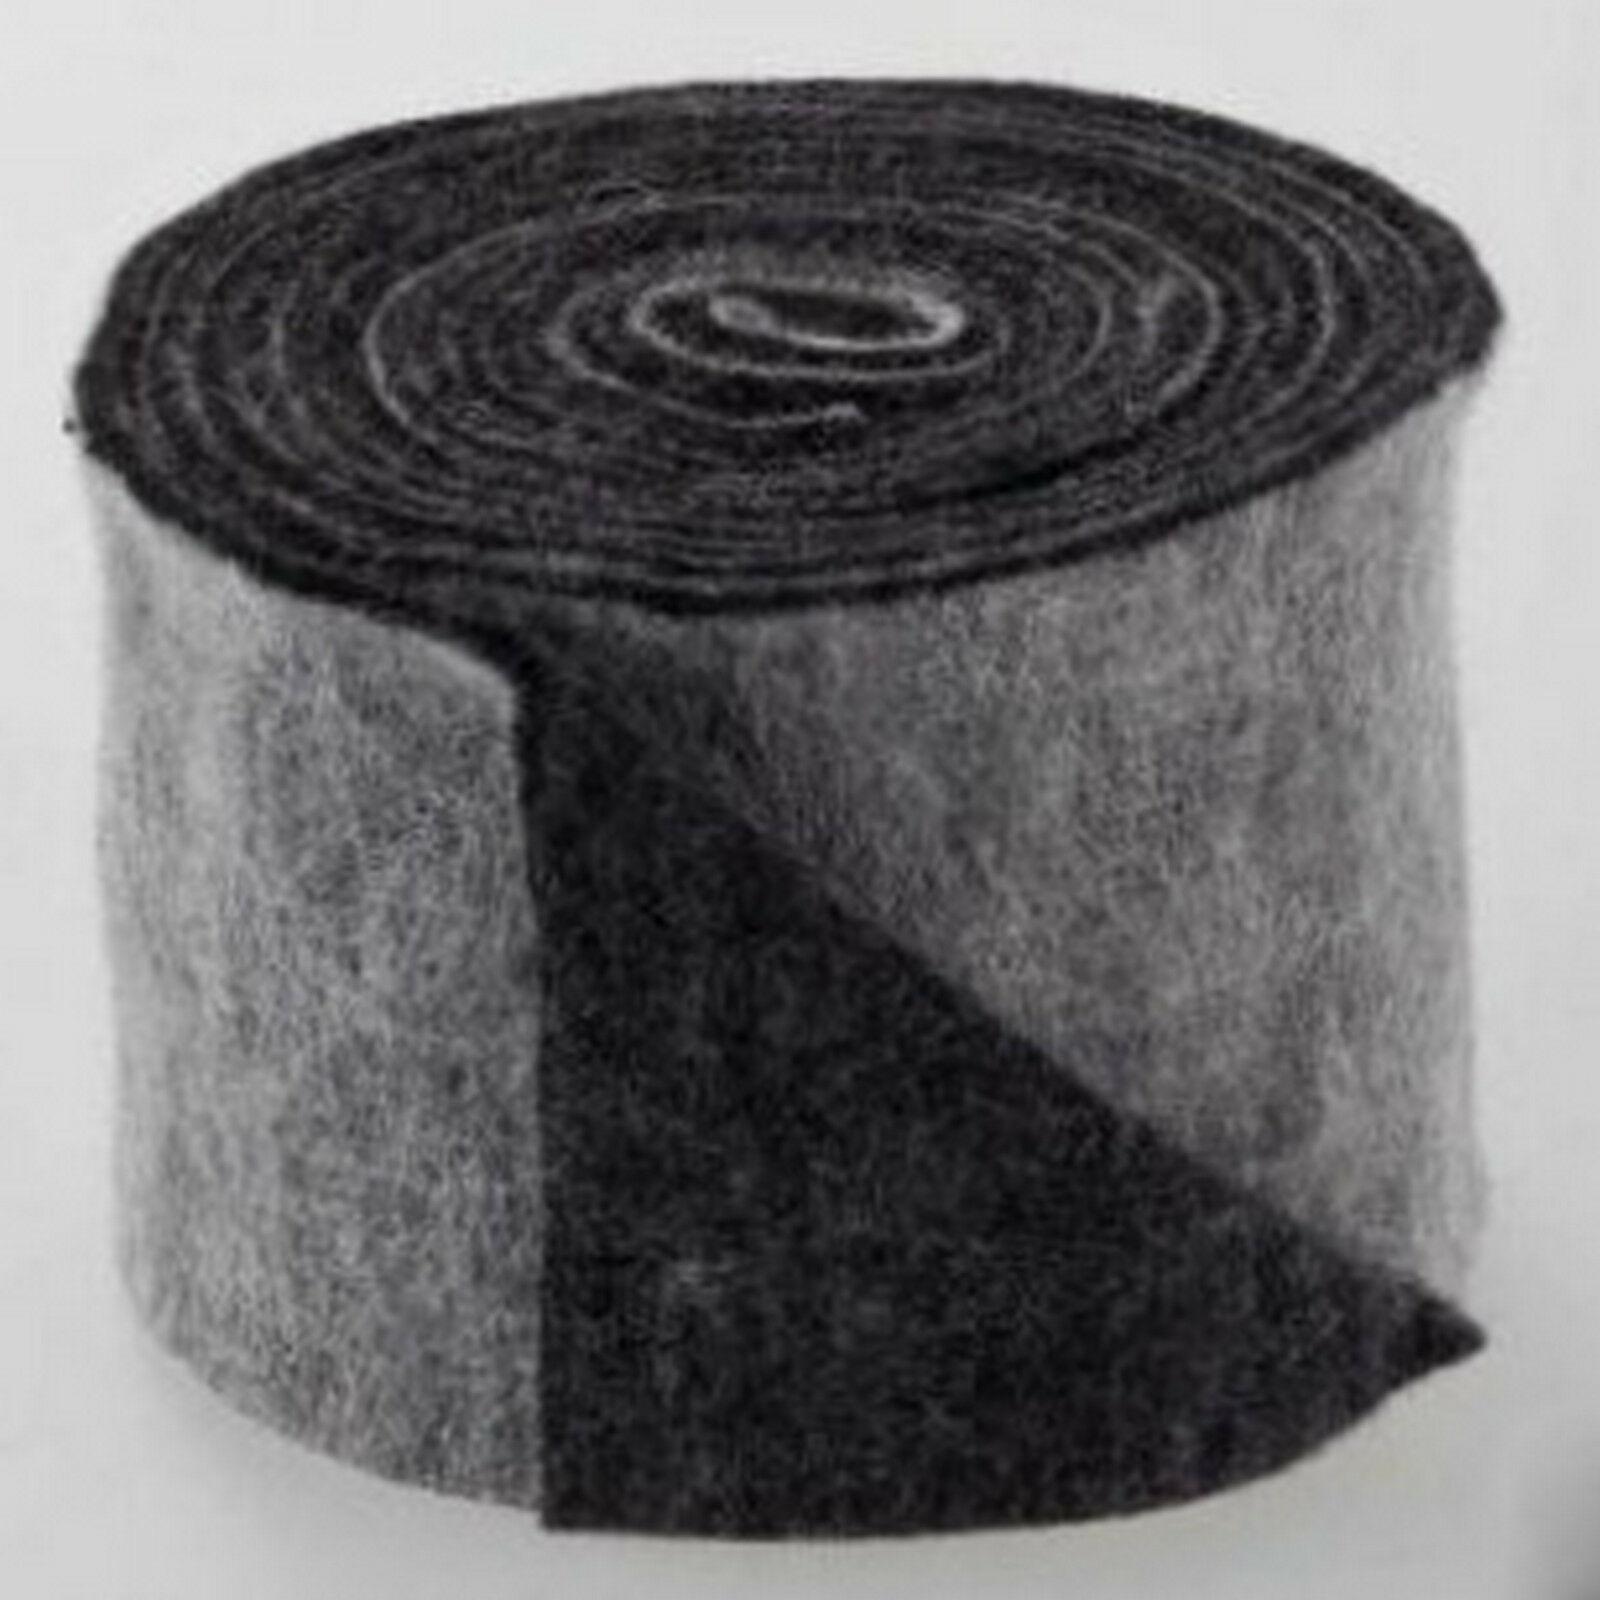 Topfband Filz 5 m x 15 cm zwei-farbige Dekoband Wollvlies Filz-Band Wollband  - grau-anthrazit